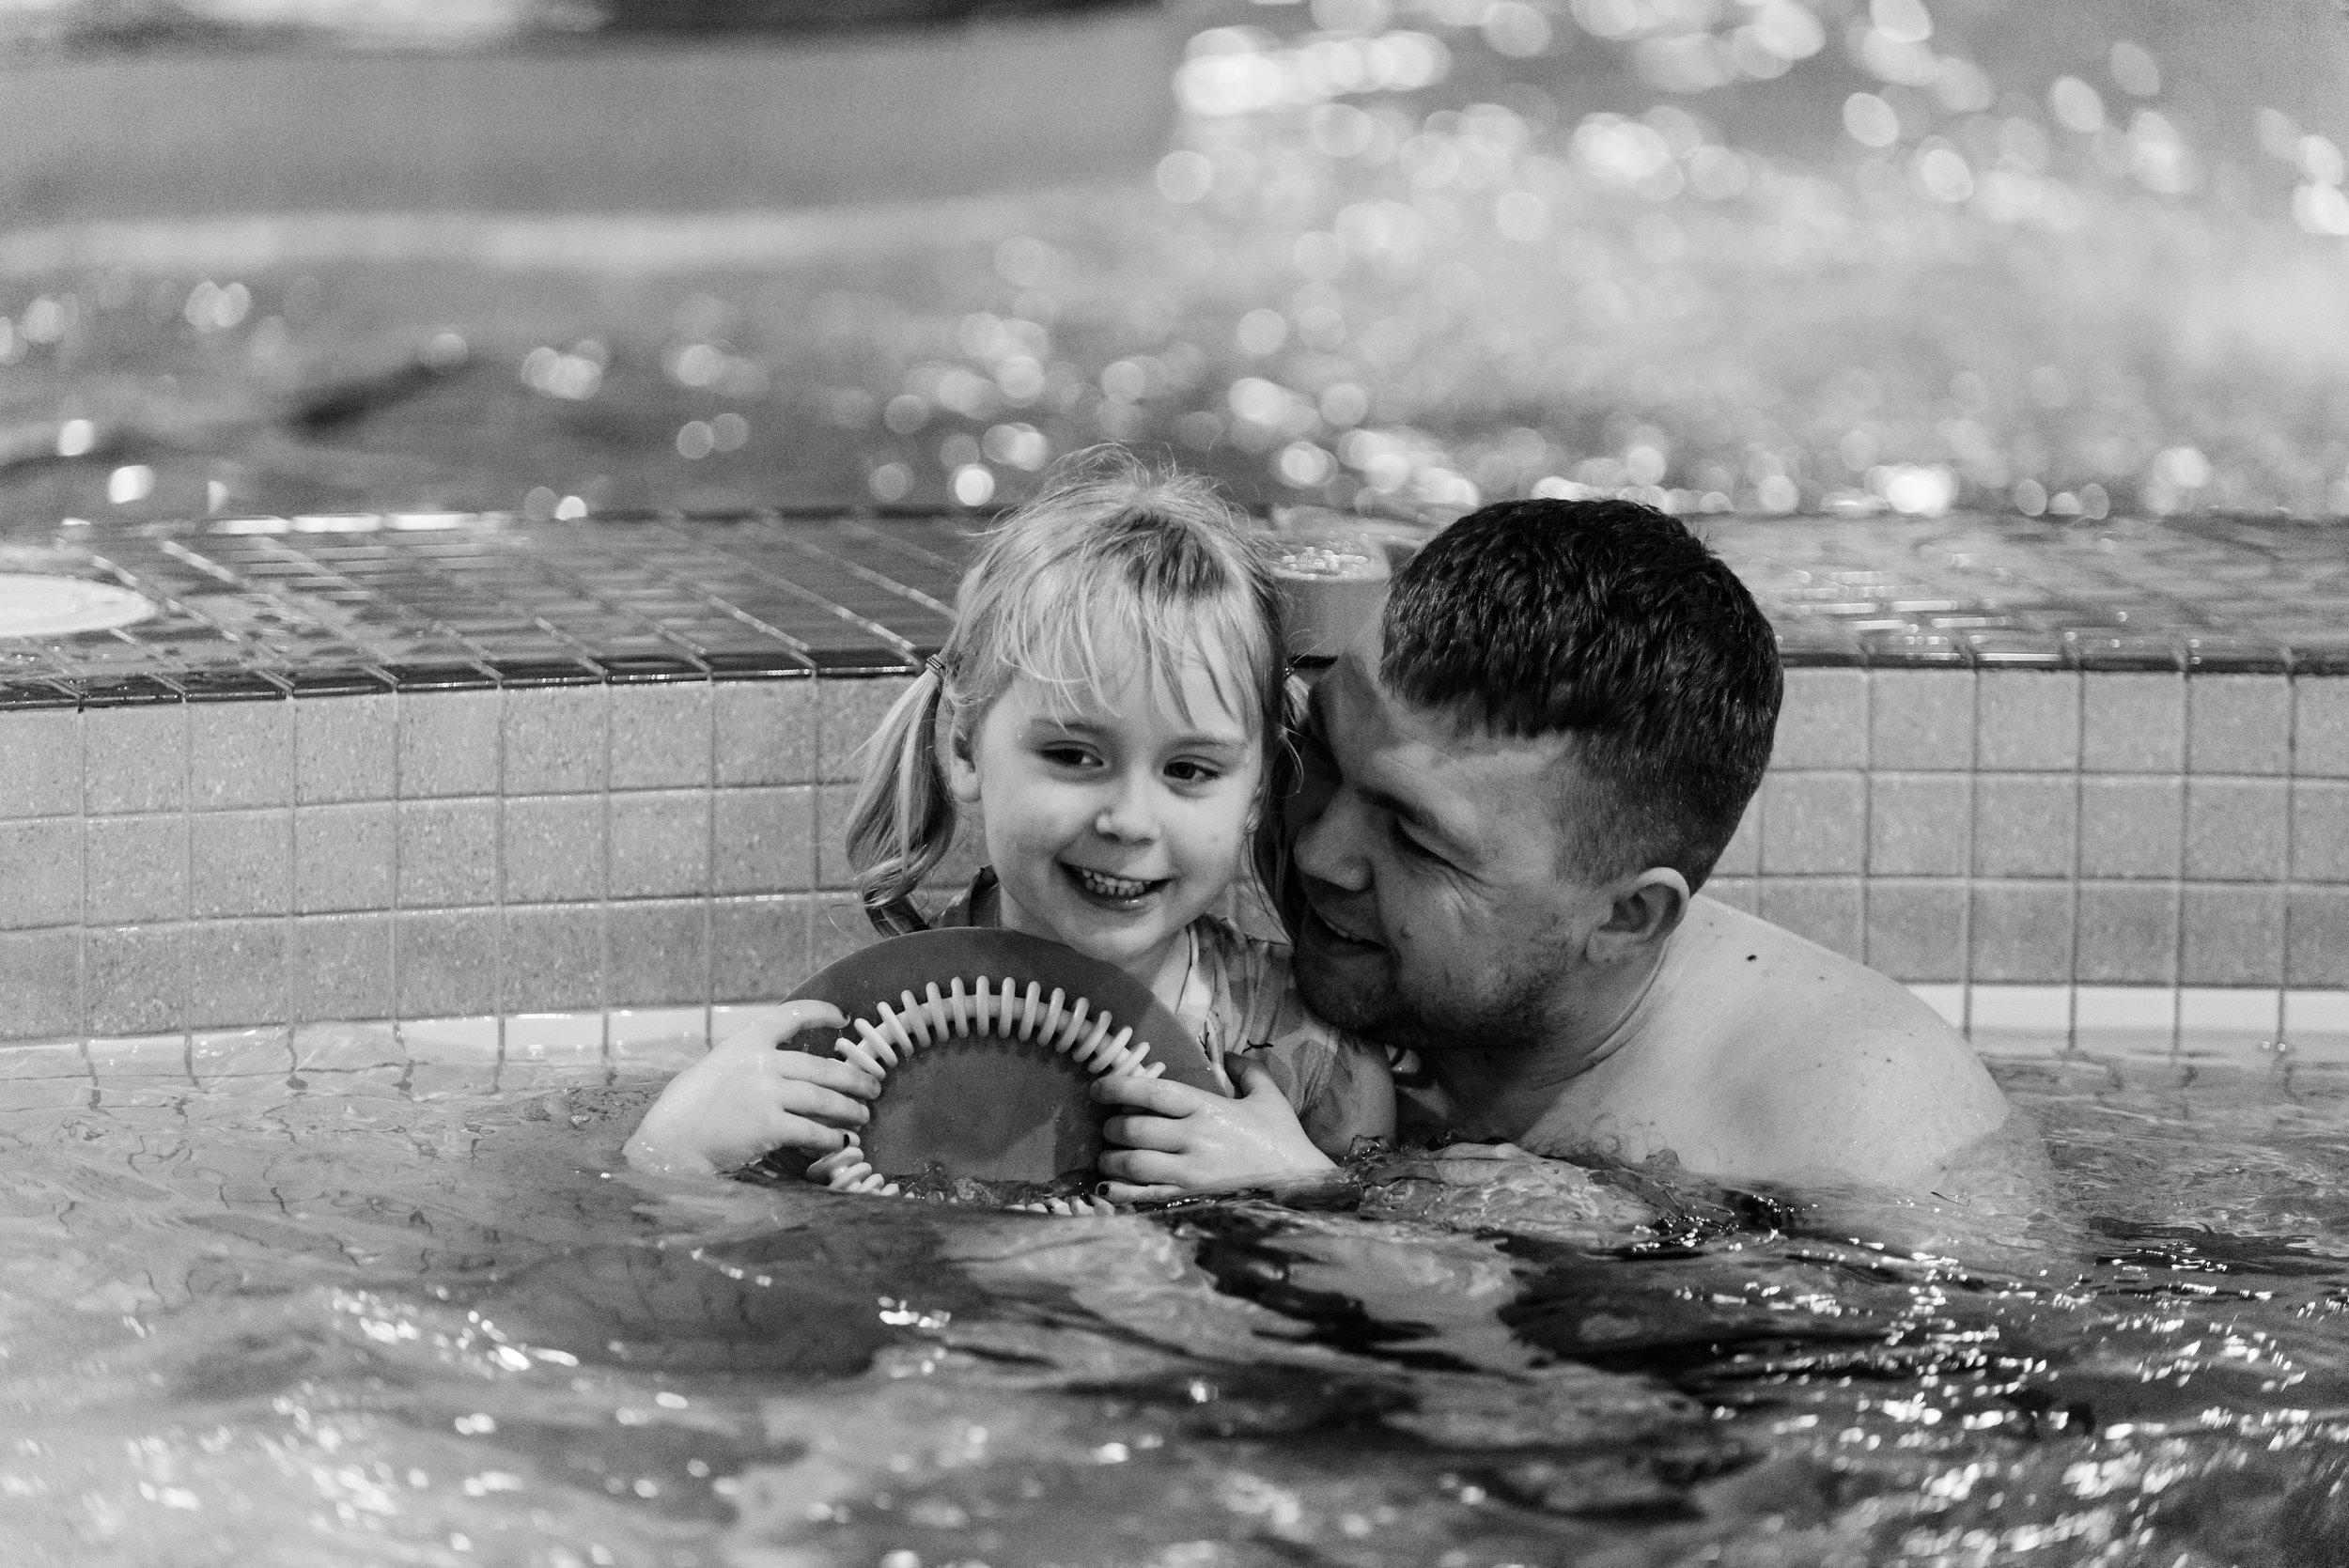 Nicola_Reiersen_Photography_Kids_Birthday_Pool_Party (4).jpg